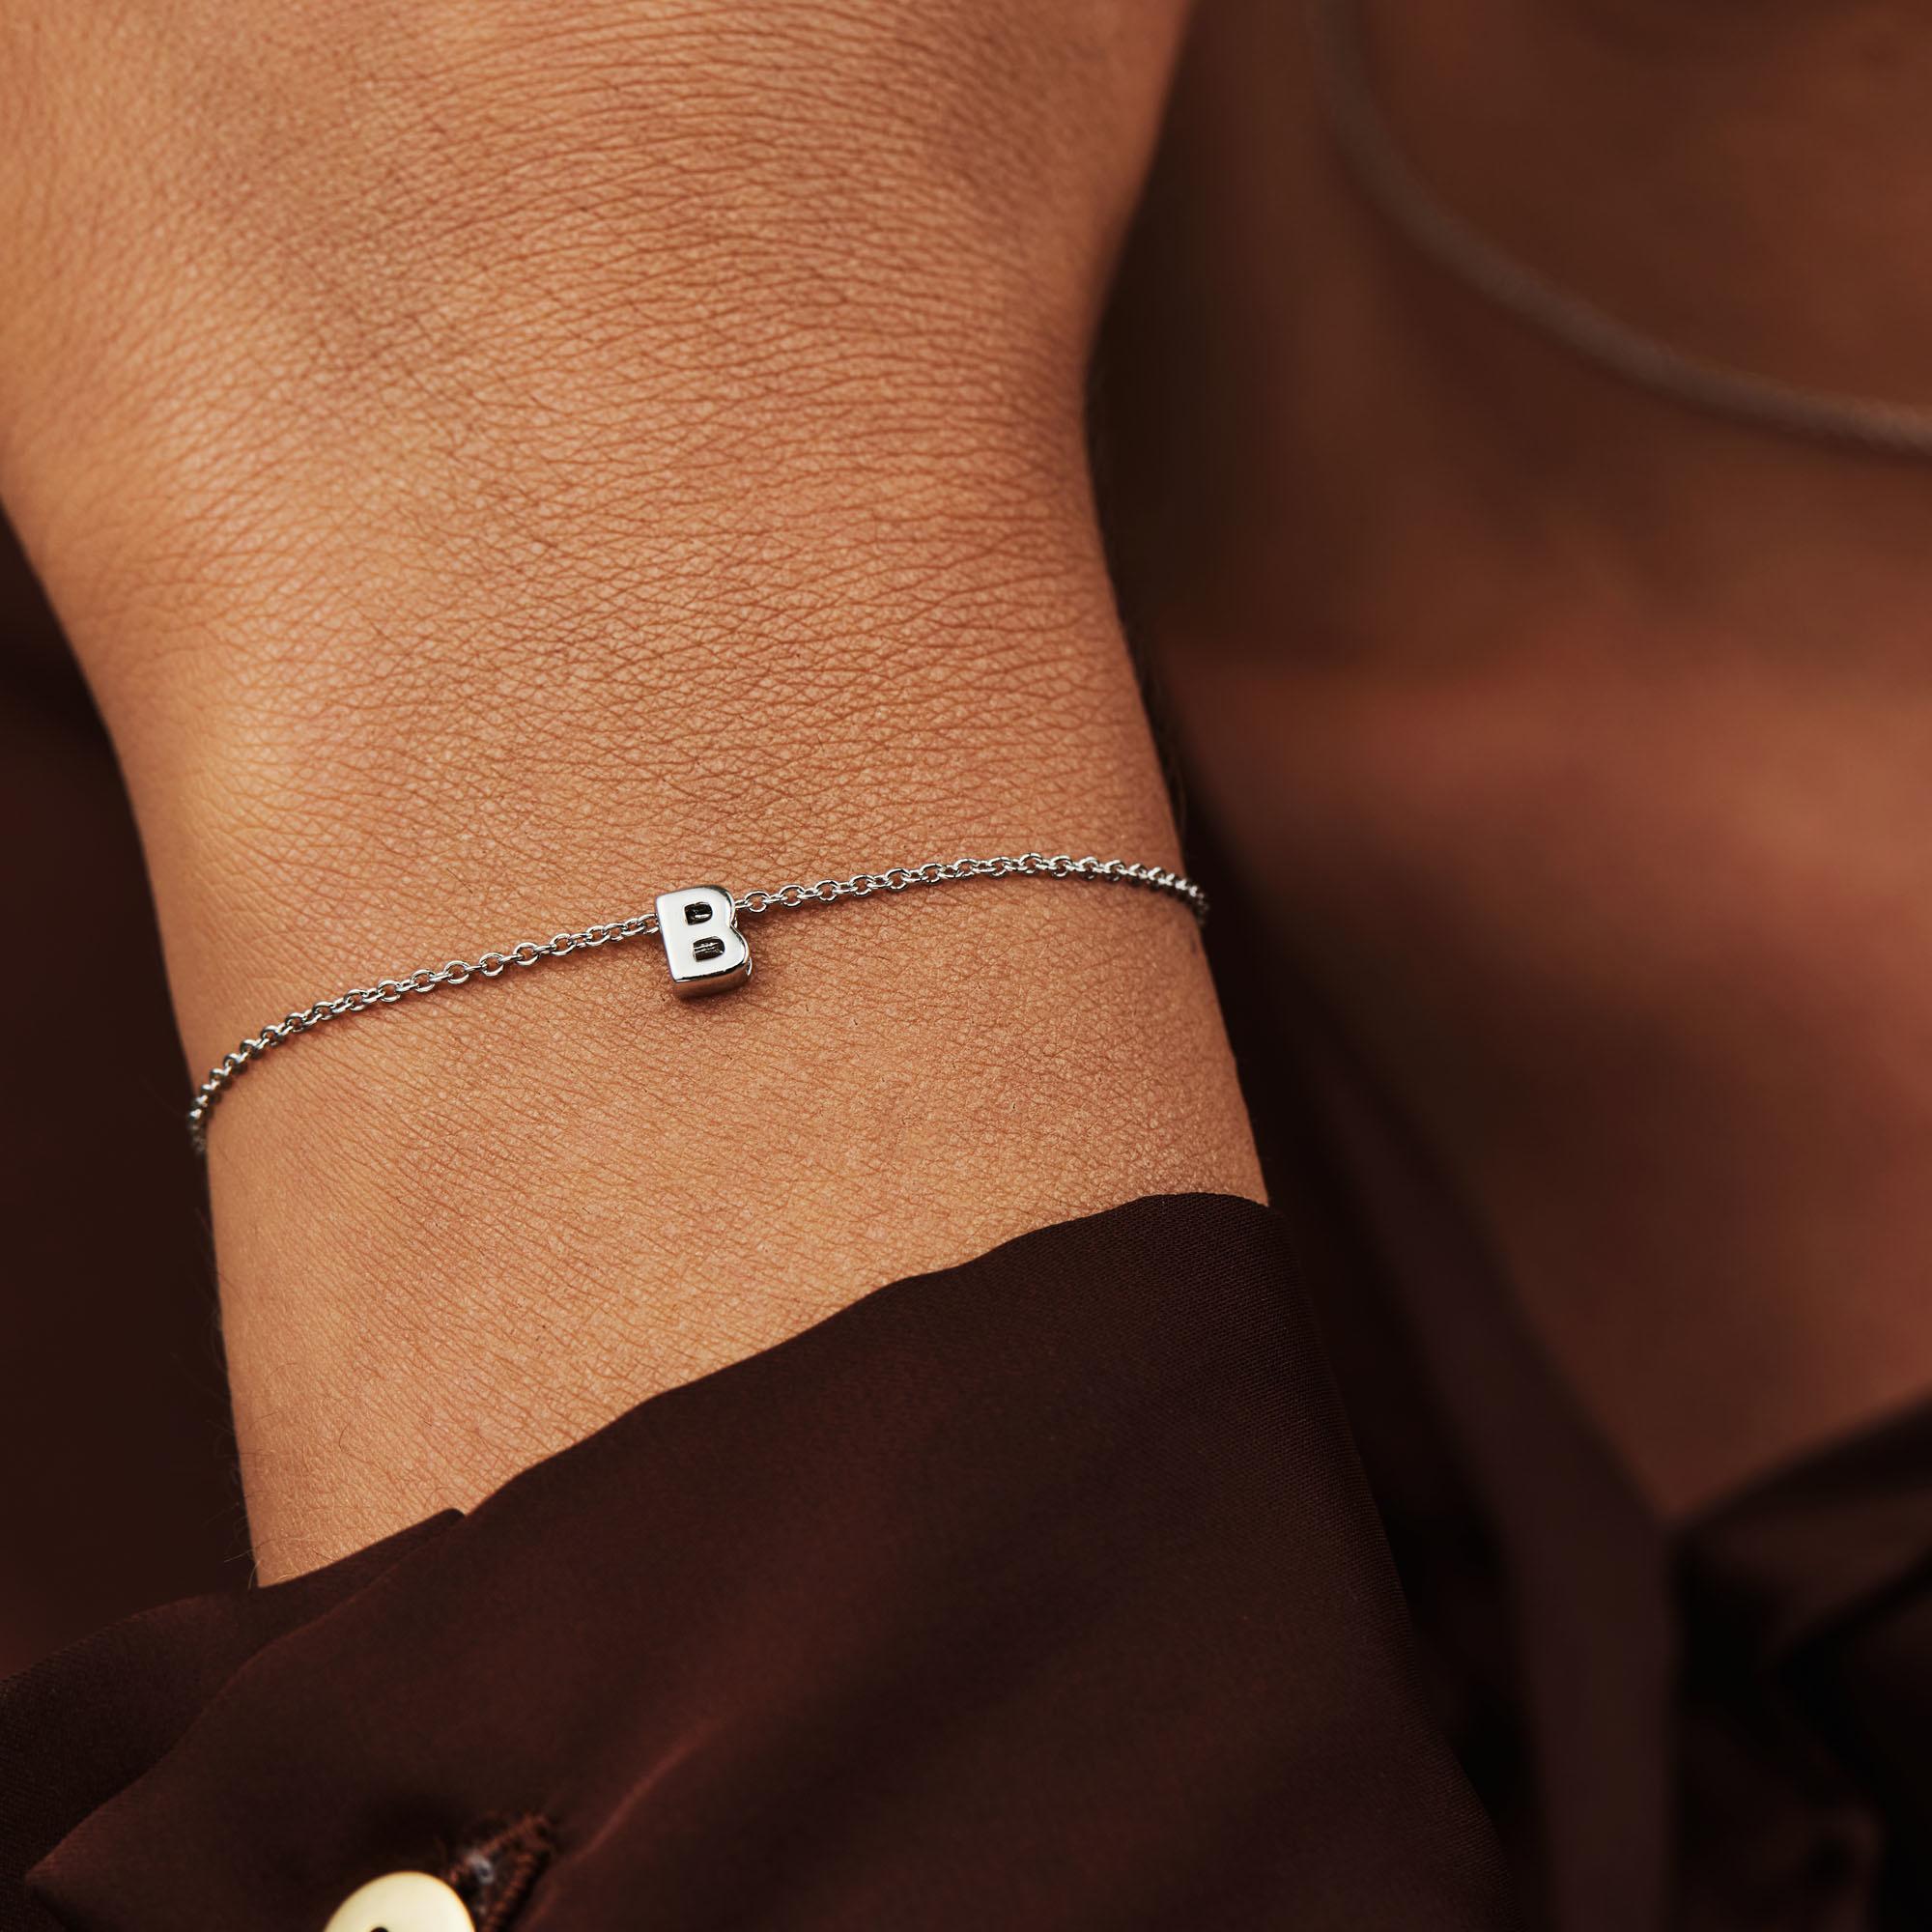 Selected Jewels Julie Chloé initialt armband i 925 sterling silver